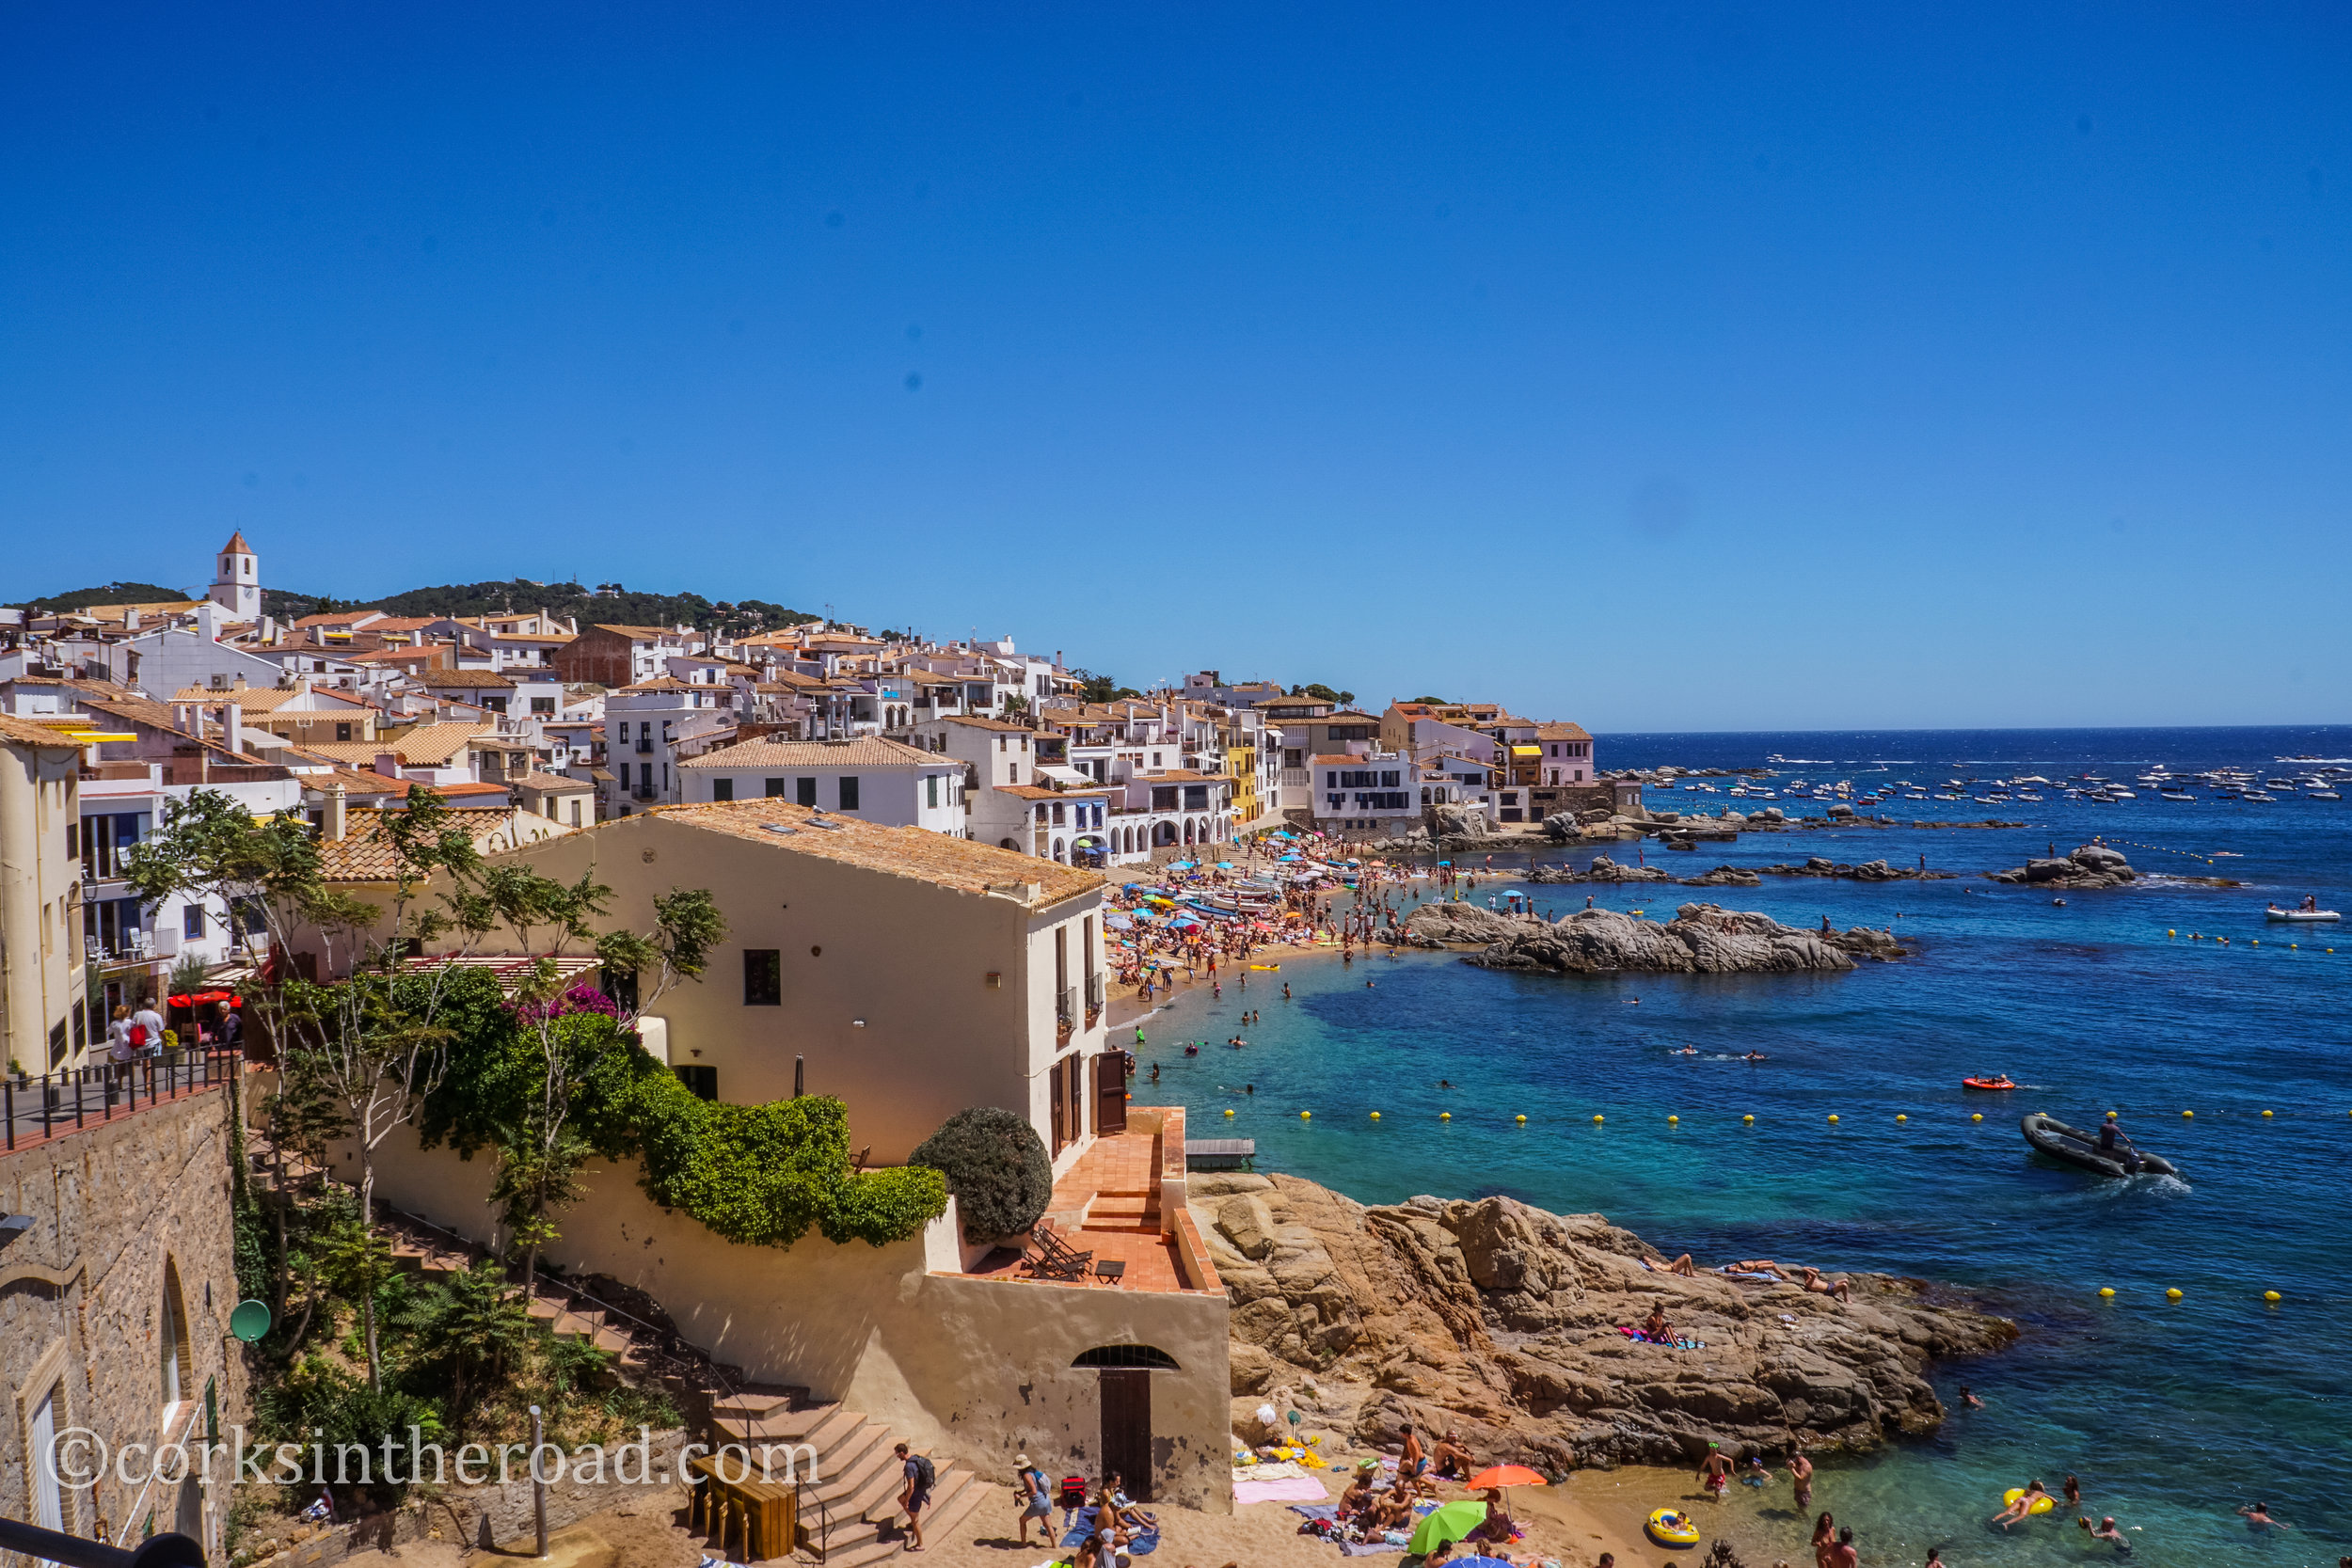 20160807Barcelona, Beaches, Corksintheroad, Costa Brava, Costa Brava Landscape.jpg